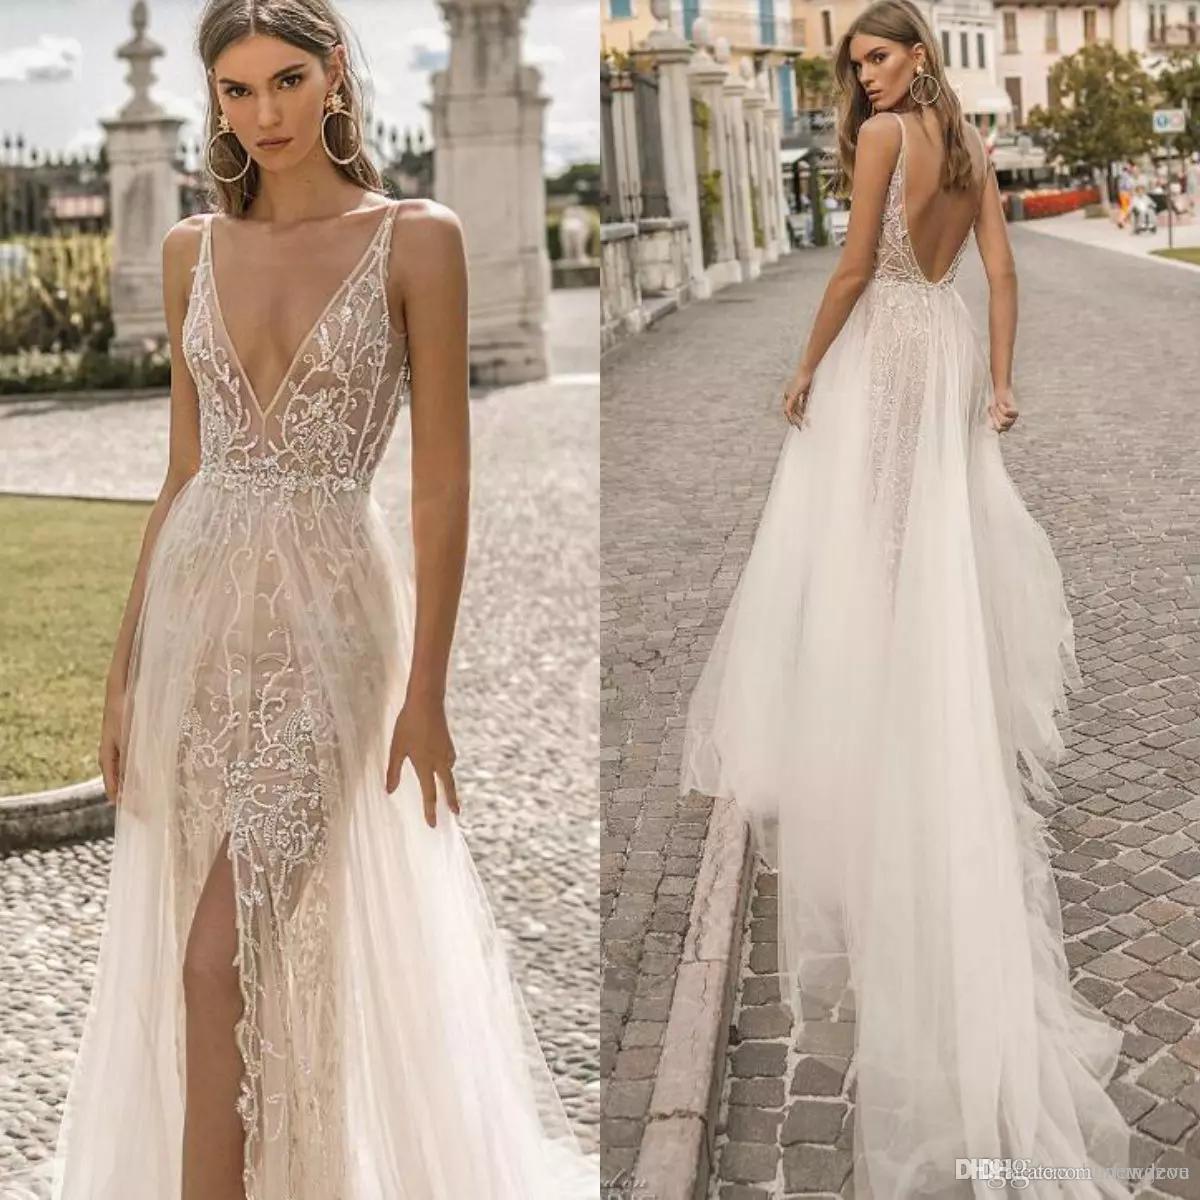 aa7002667378 Discount Berta 2019 Beach Wedding Dresses Illusion V Neck Lace Appliques Bridal  Gowns Side Split Tulle Backless Designer A Line Wedding Dresses Wedding ...